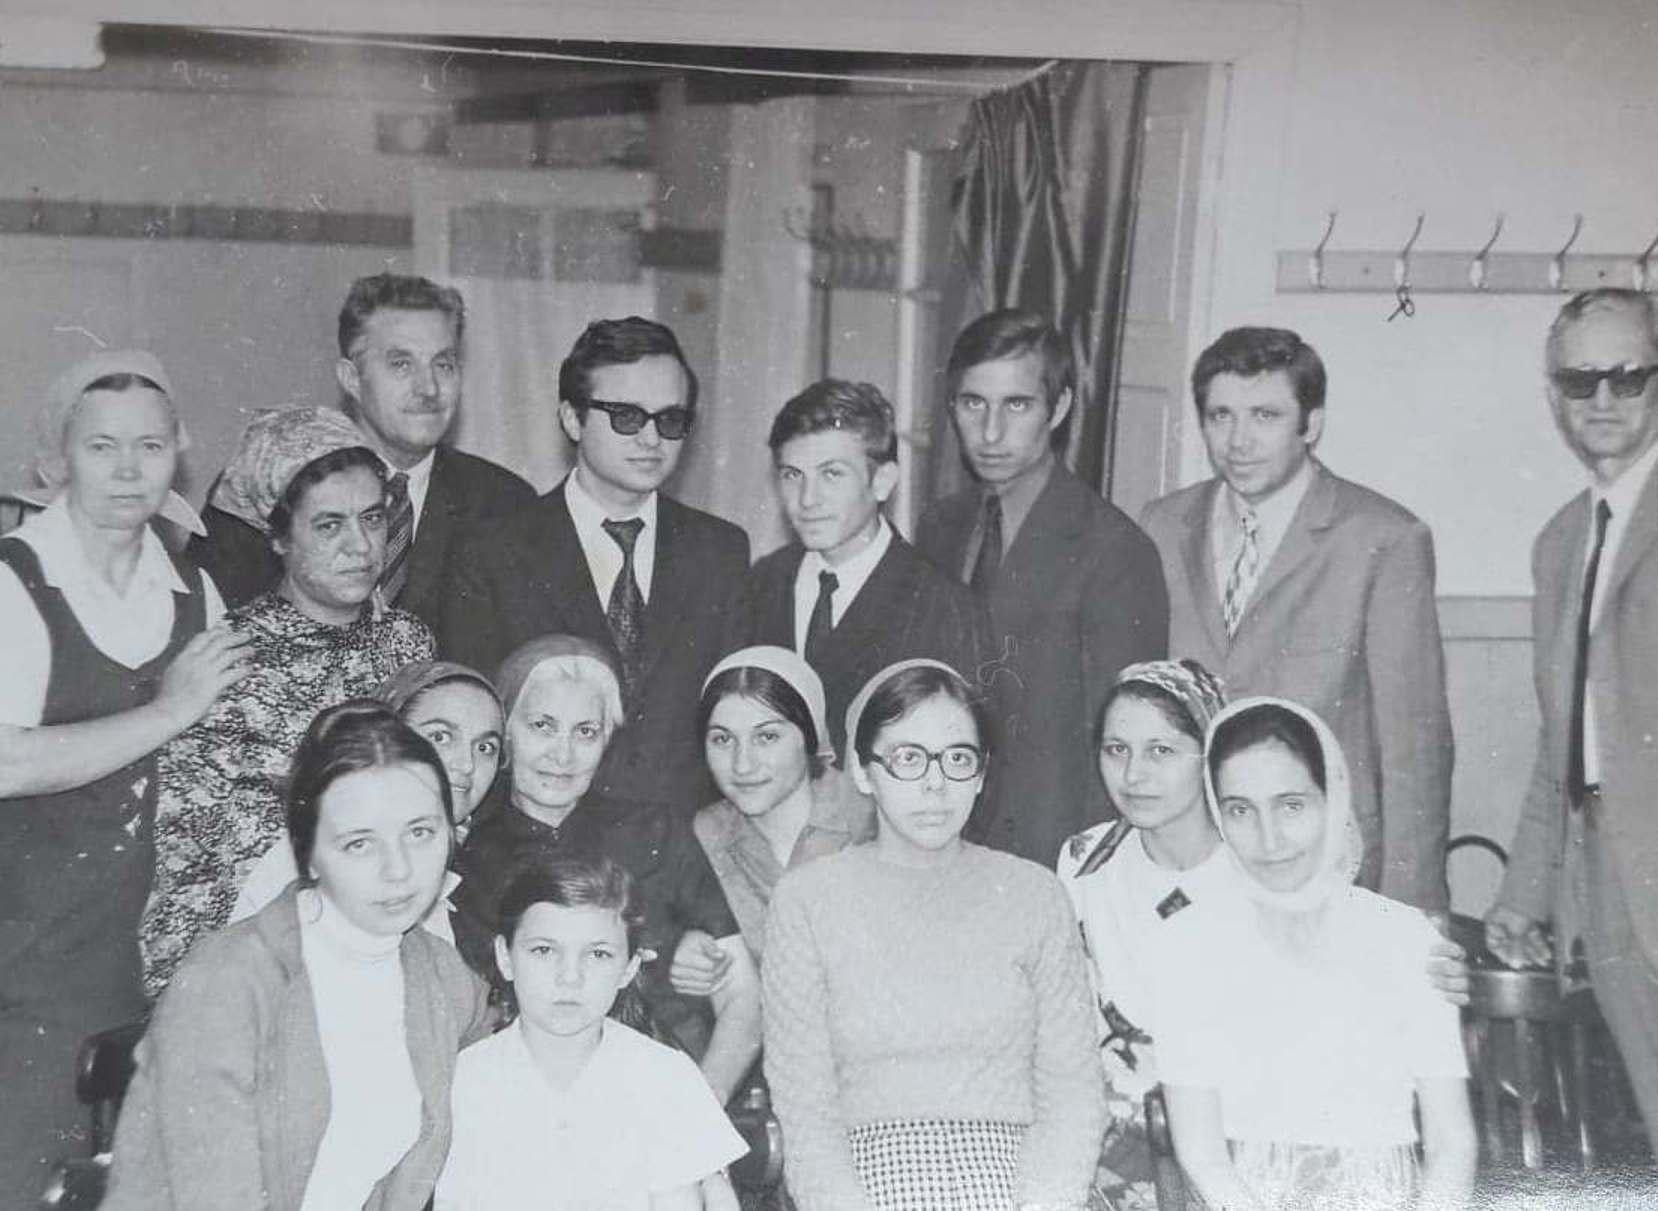 CREDINCIOSI BOTEZATI IN ZIUA DE 30 MAI 1976 IN BISERICA CRESTINA DUPA EVANGHELIE DRAGOS VODA BUCURESTI